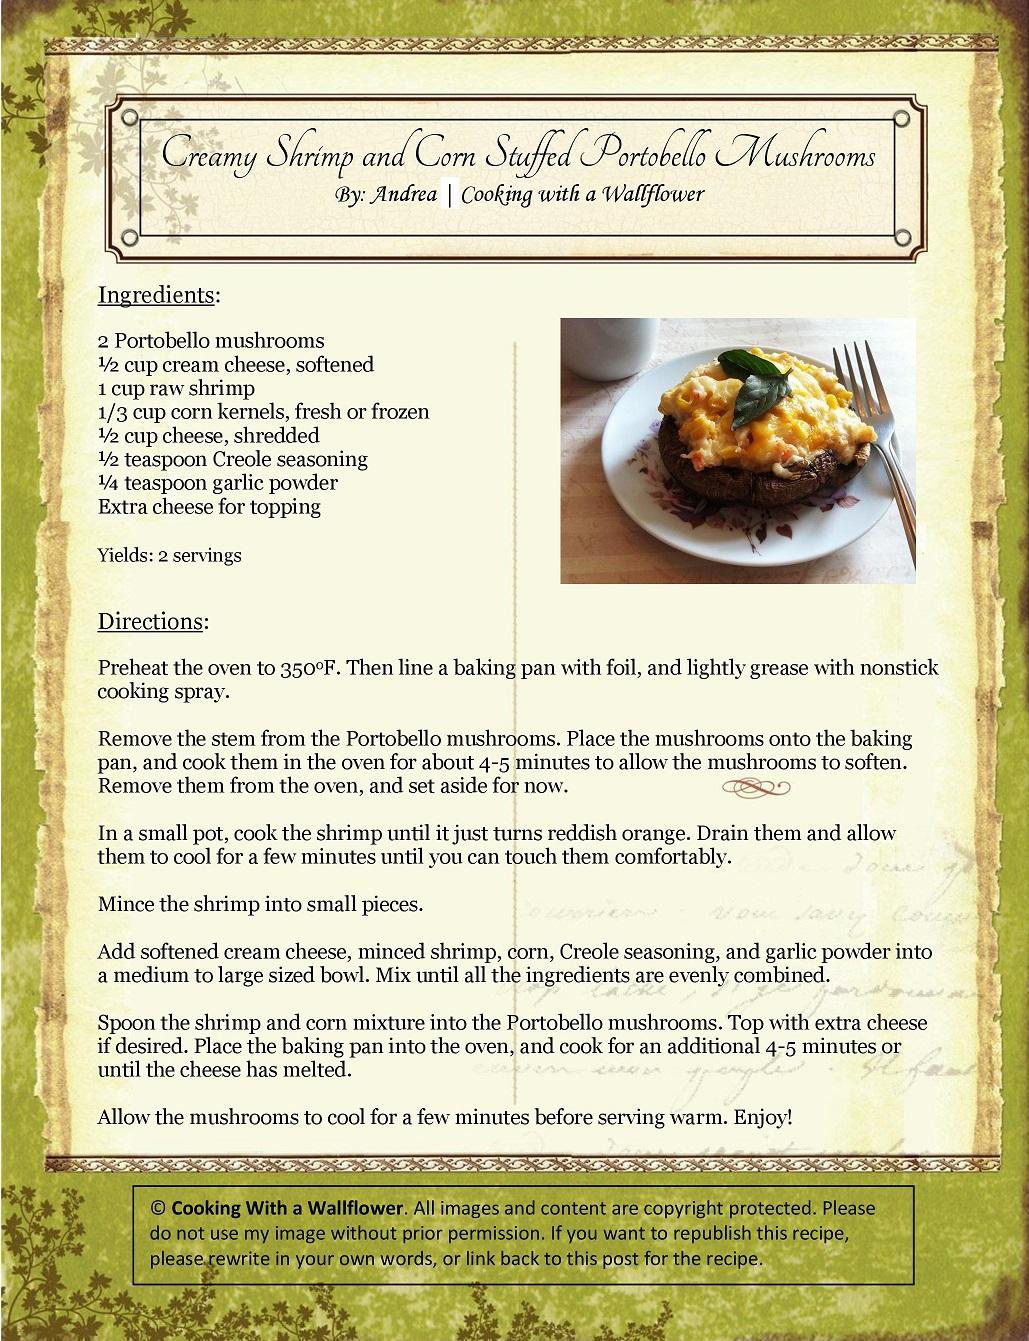 Creamy Shrimp and Corn Stuffed Portobello Mushrooms Recipe Card